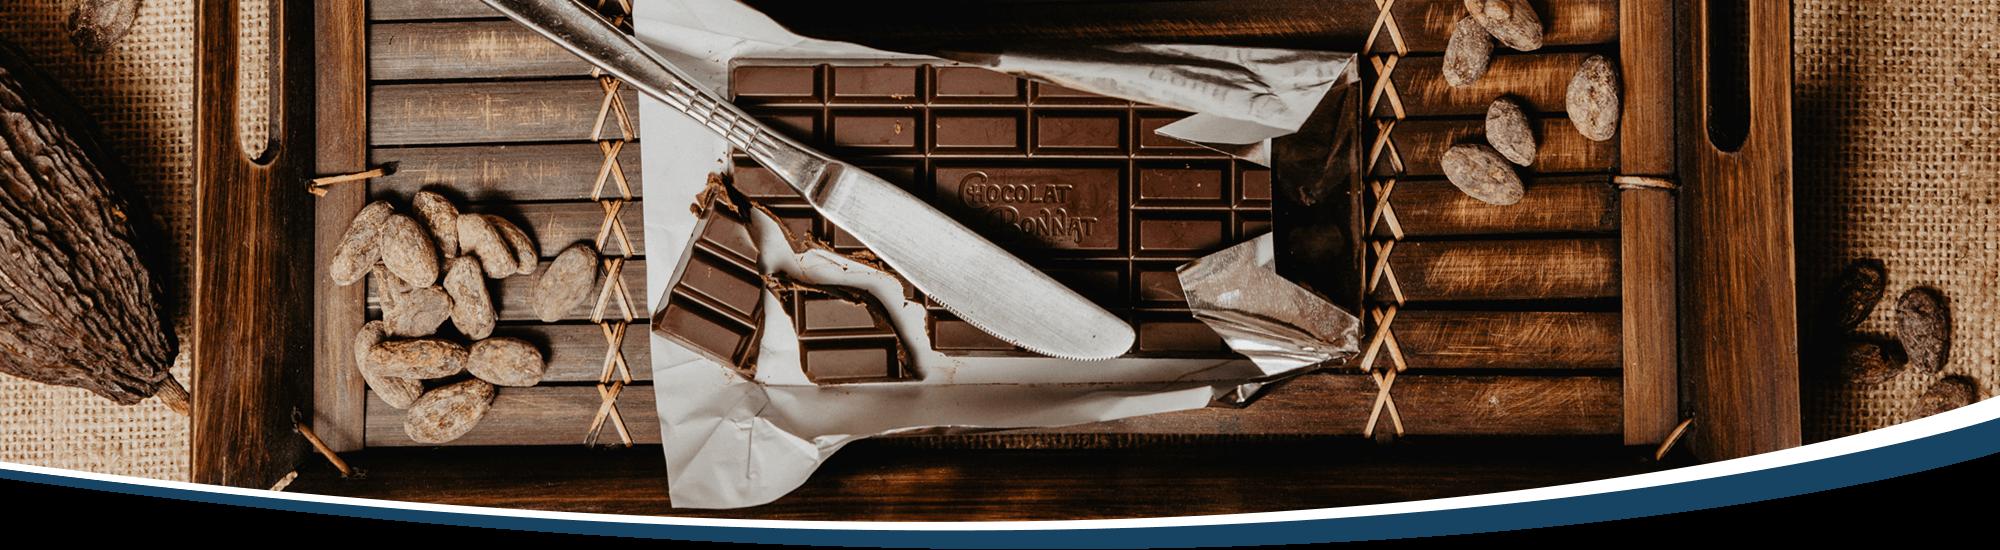 Tafel Schokolade dekorativ drapiert